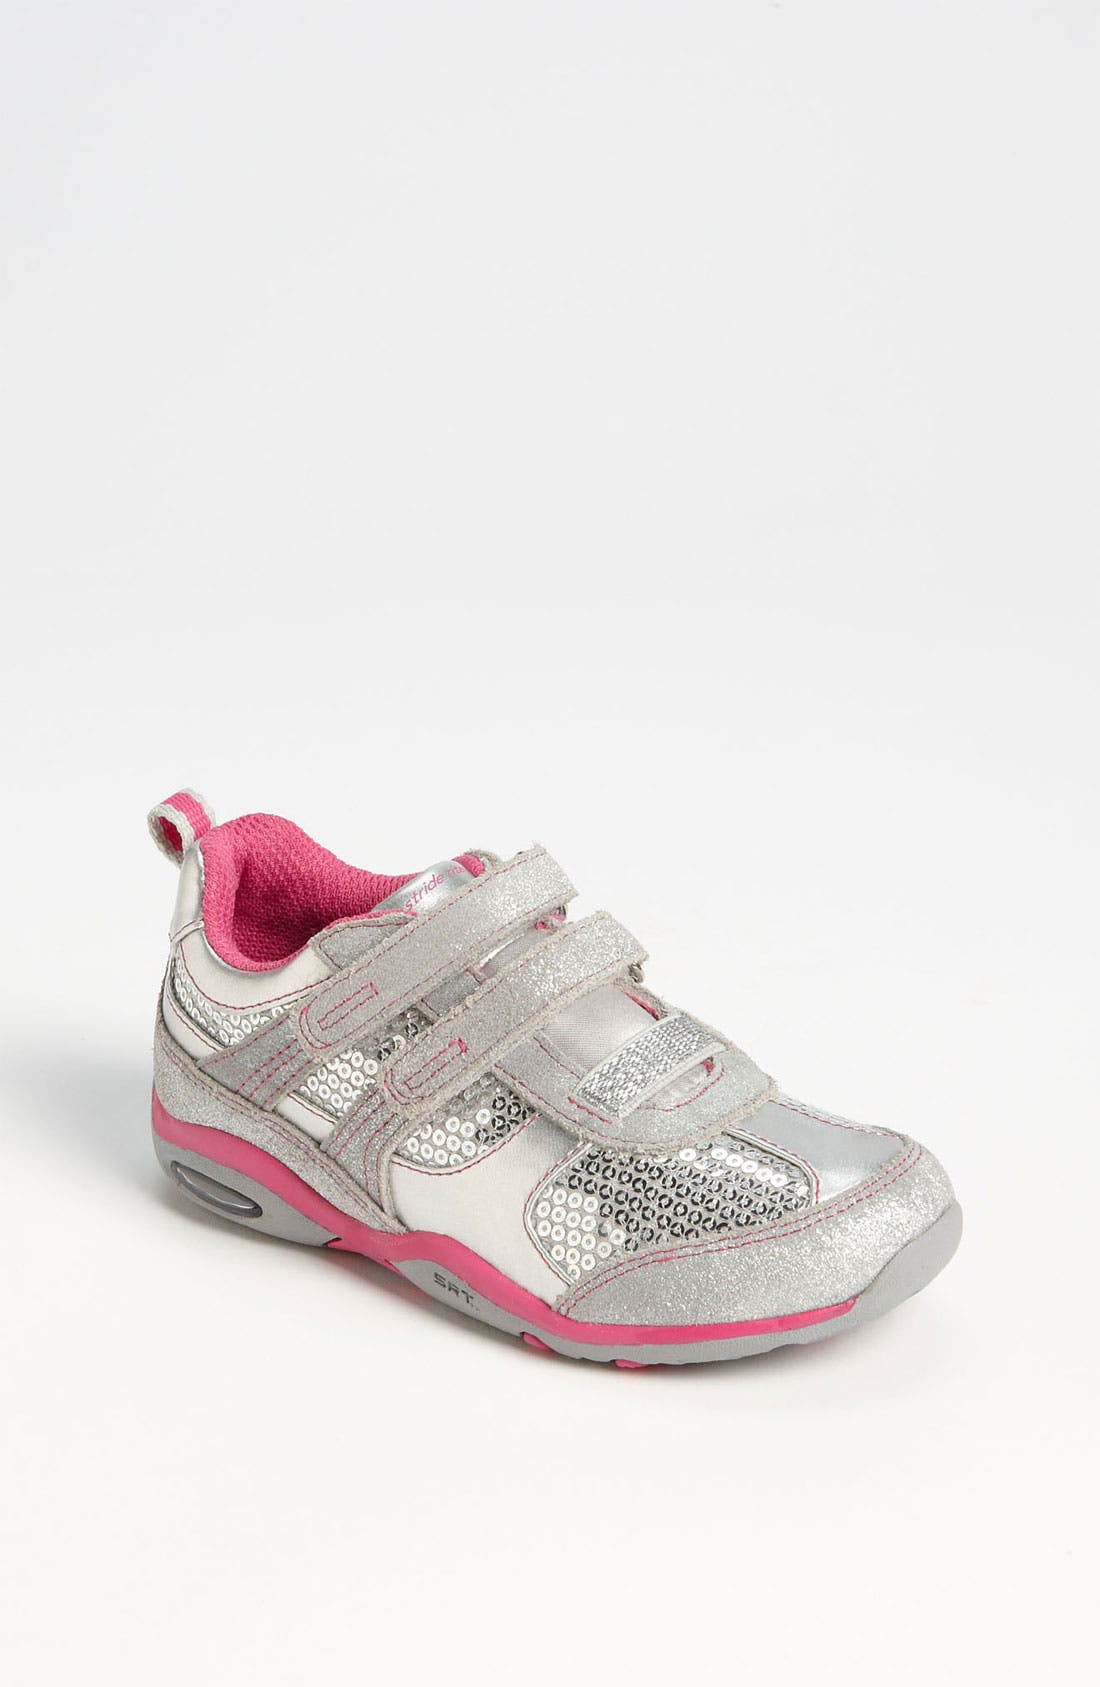 Alternate Image 1 Selected - Stride Rite 'Brook' Sneaker (Toddler & Little Kid)